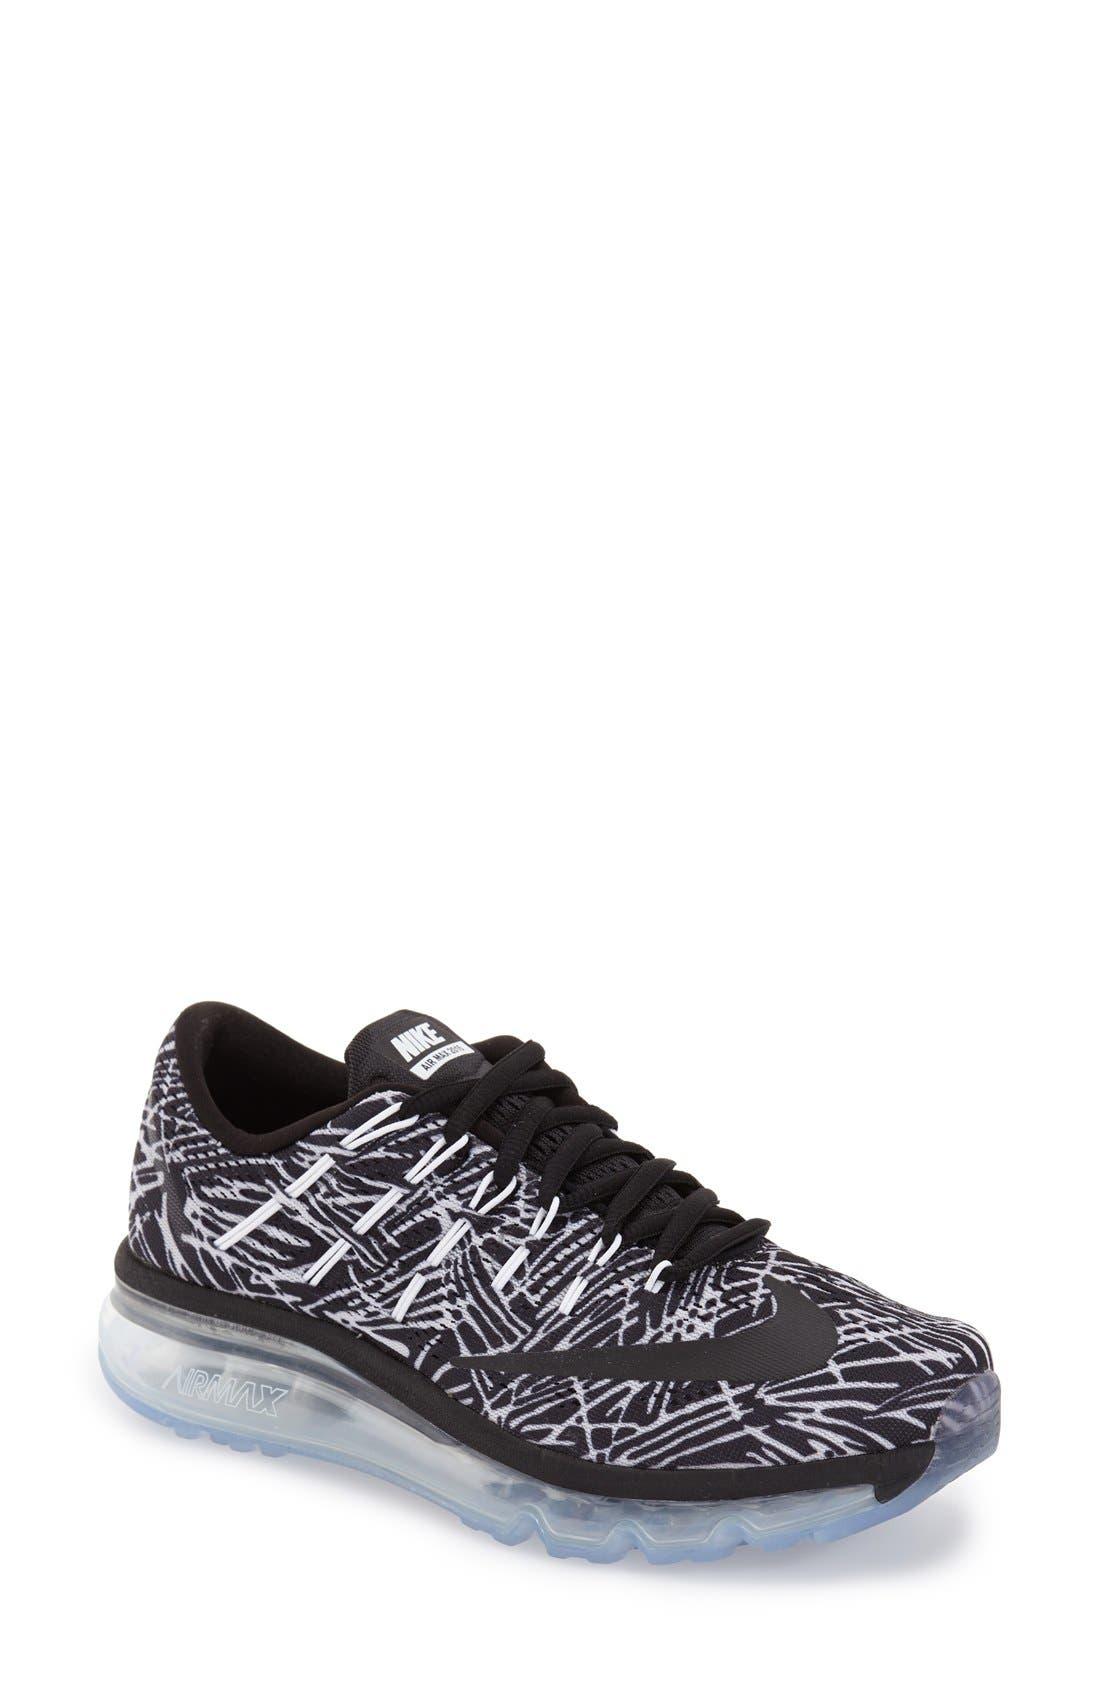 Alternate Image 1 Selected - Nike 'Air Max 2016' Running Shoe (Women)